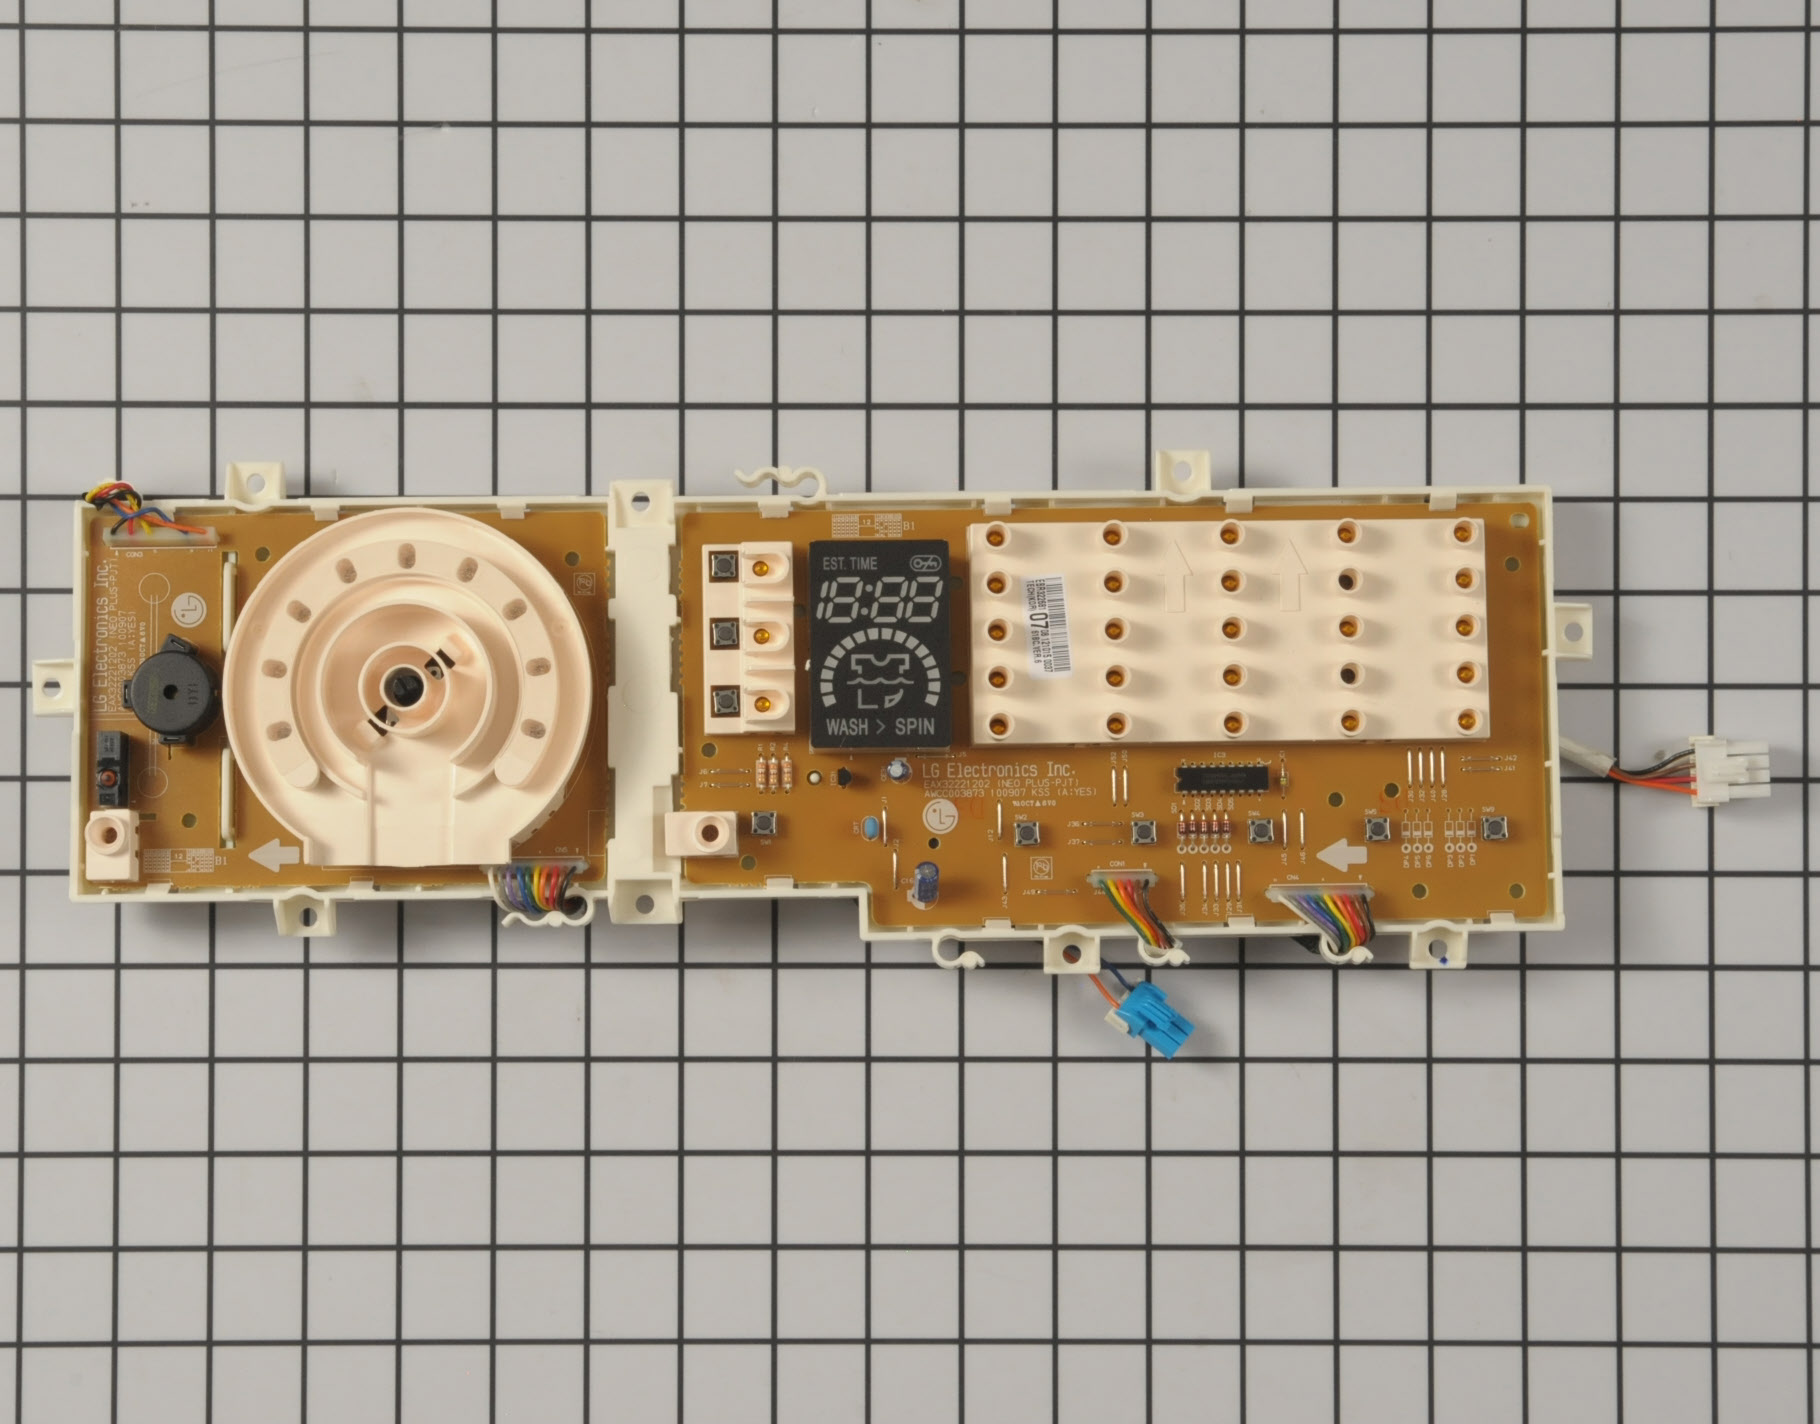 LG Washing Machine Part # EBR32268107 - User Control and Display Board